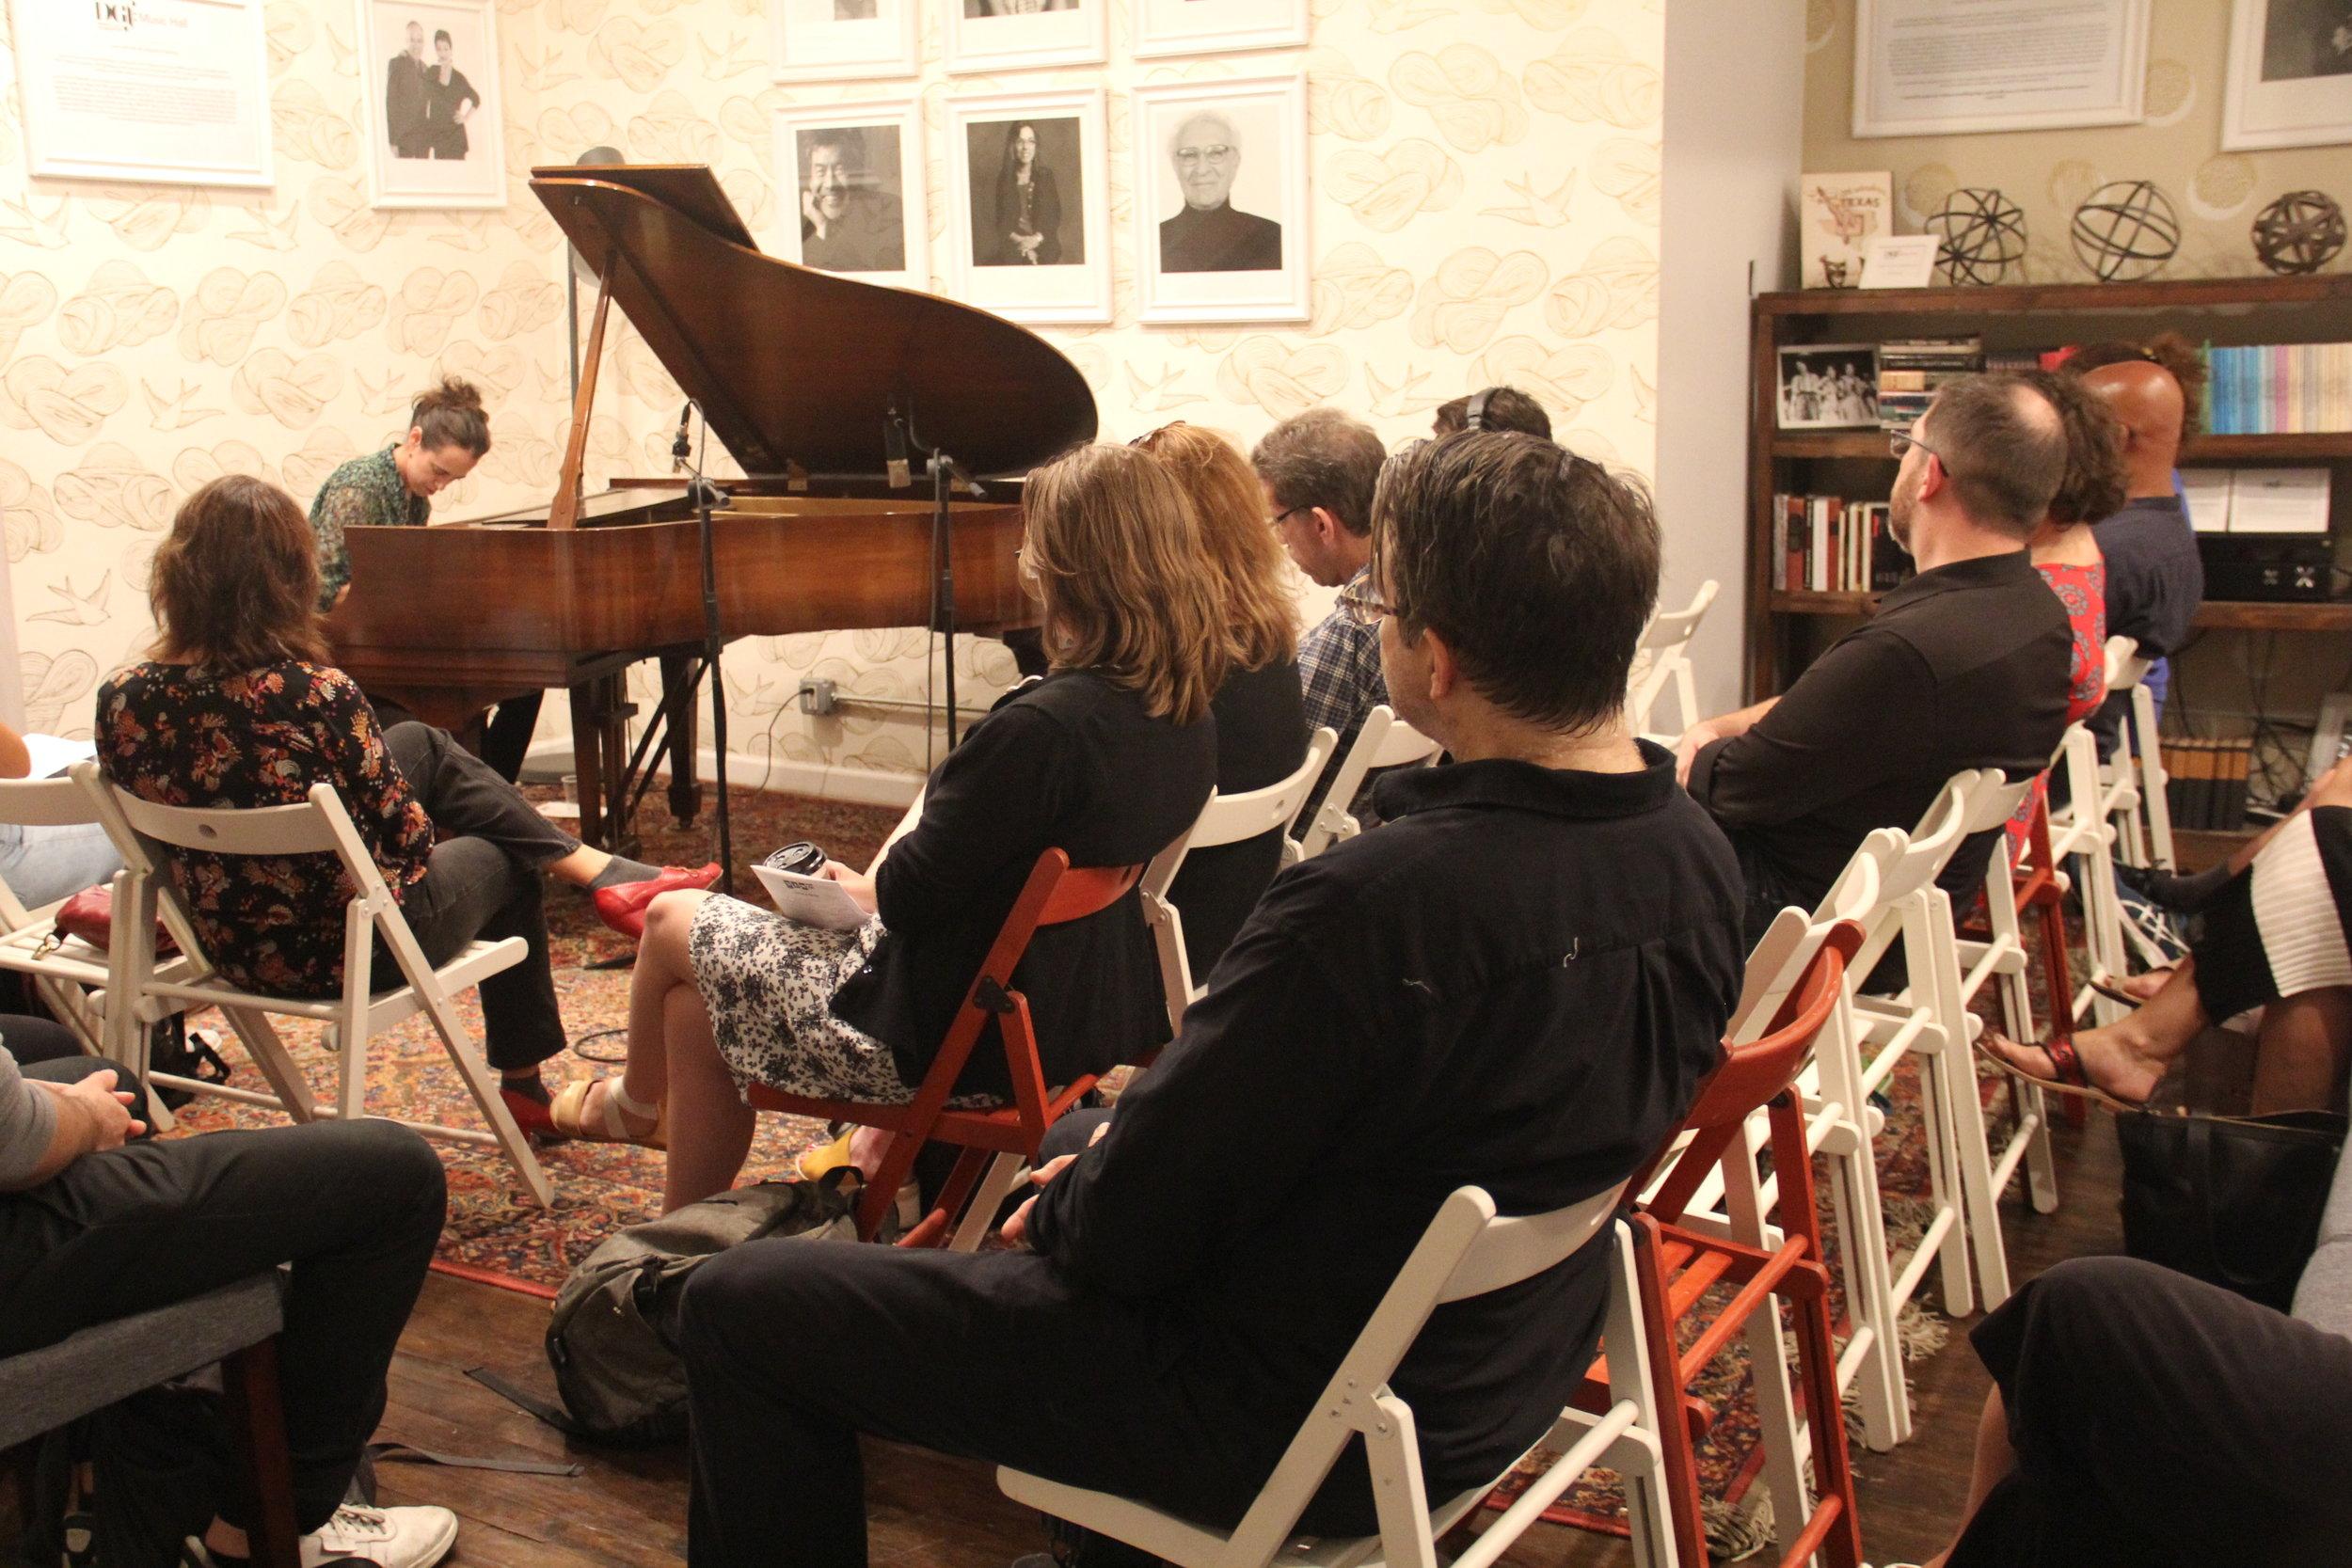 Mara Rosenbloom performs her improvisational piece.  Photo by Jagruti Deshmukh.